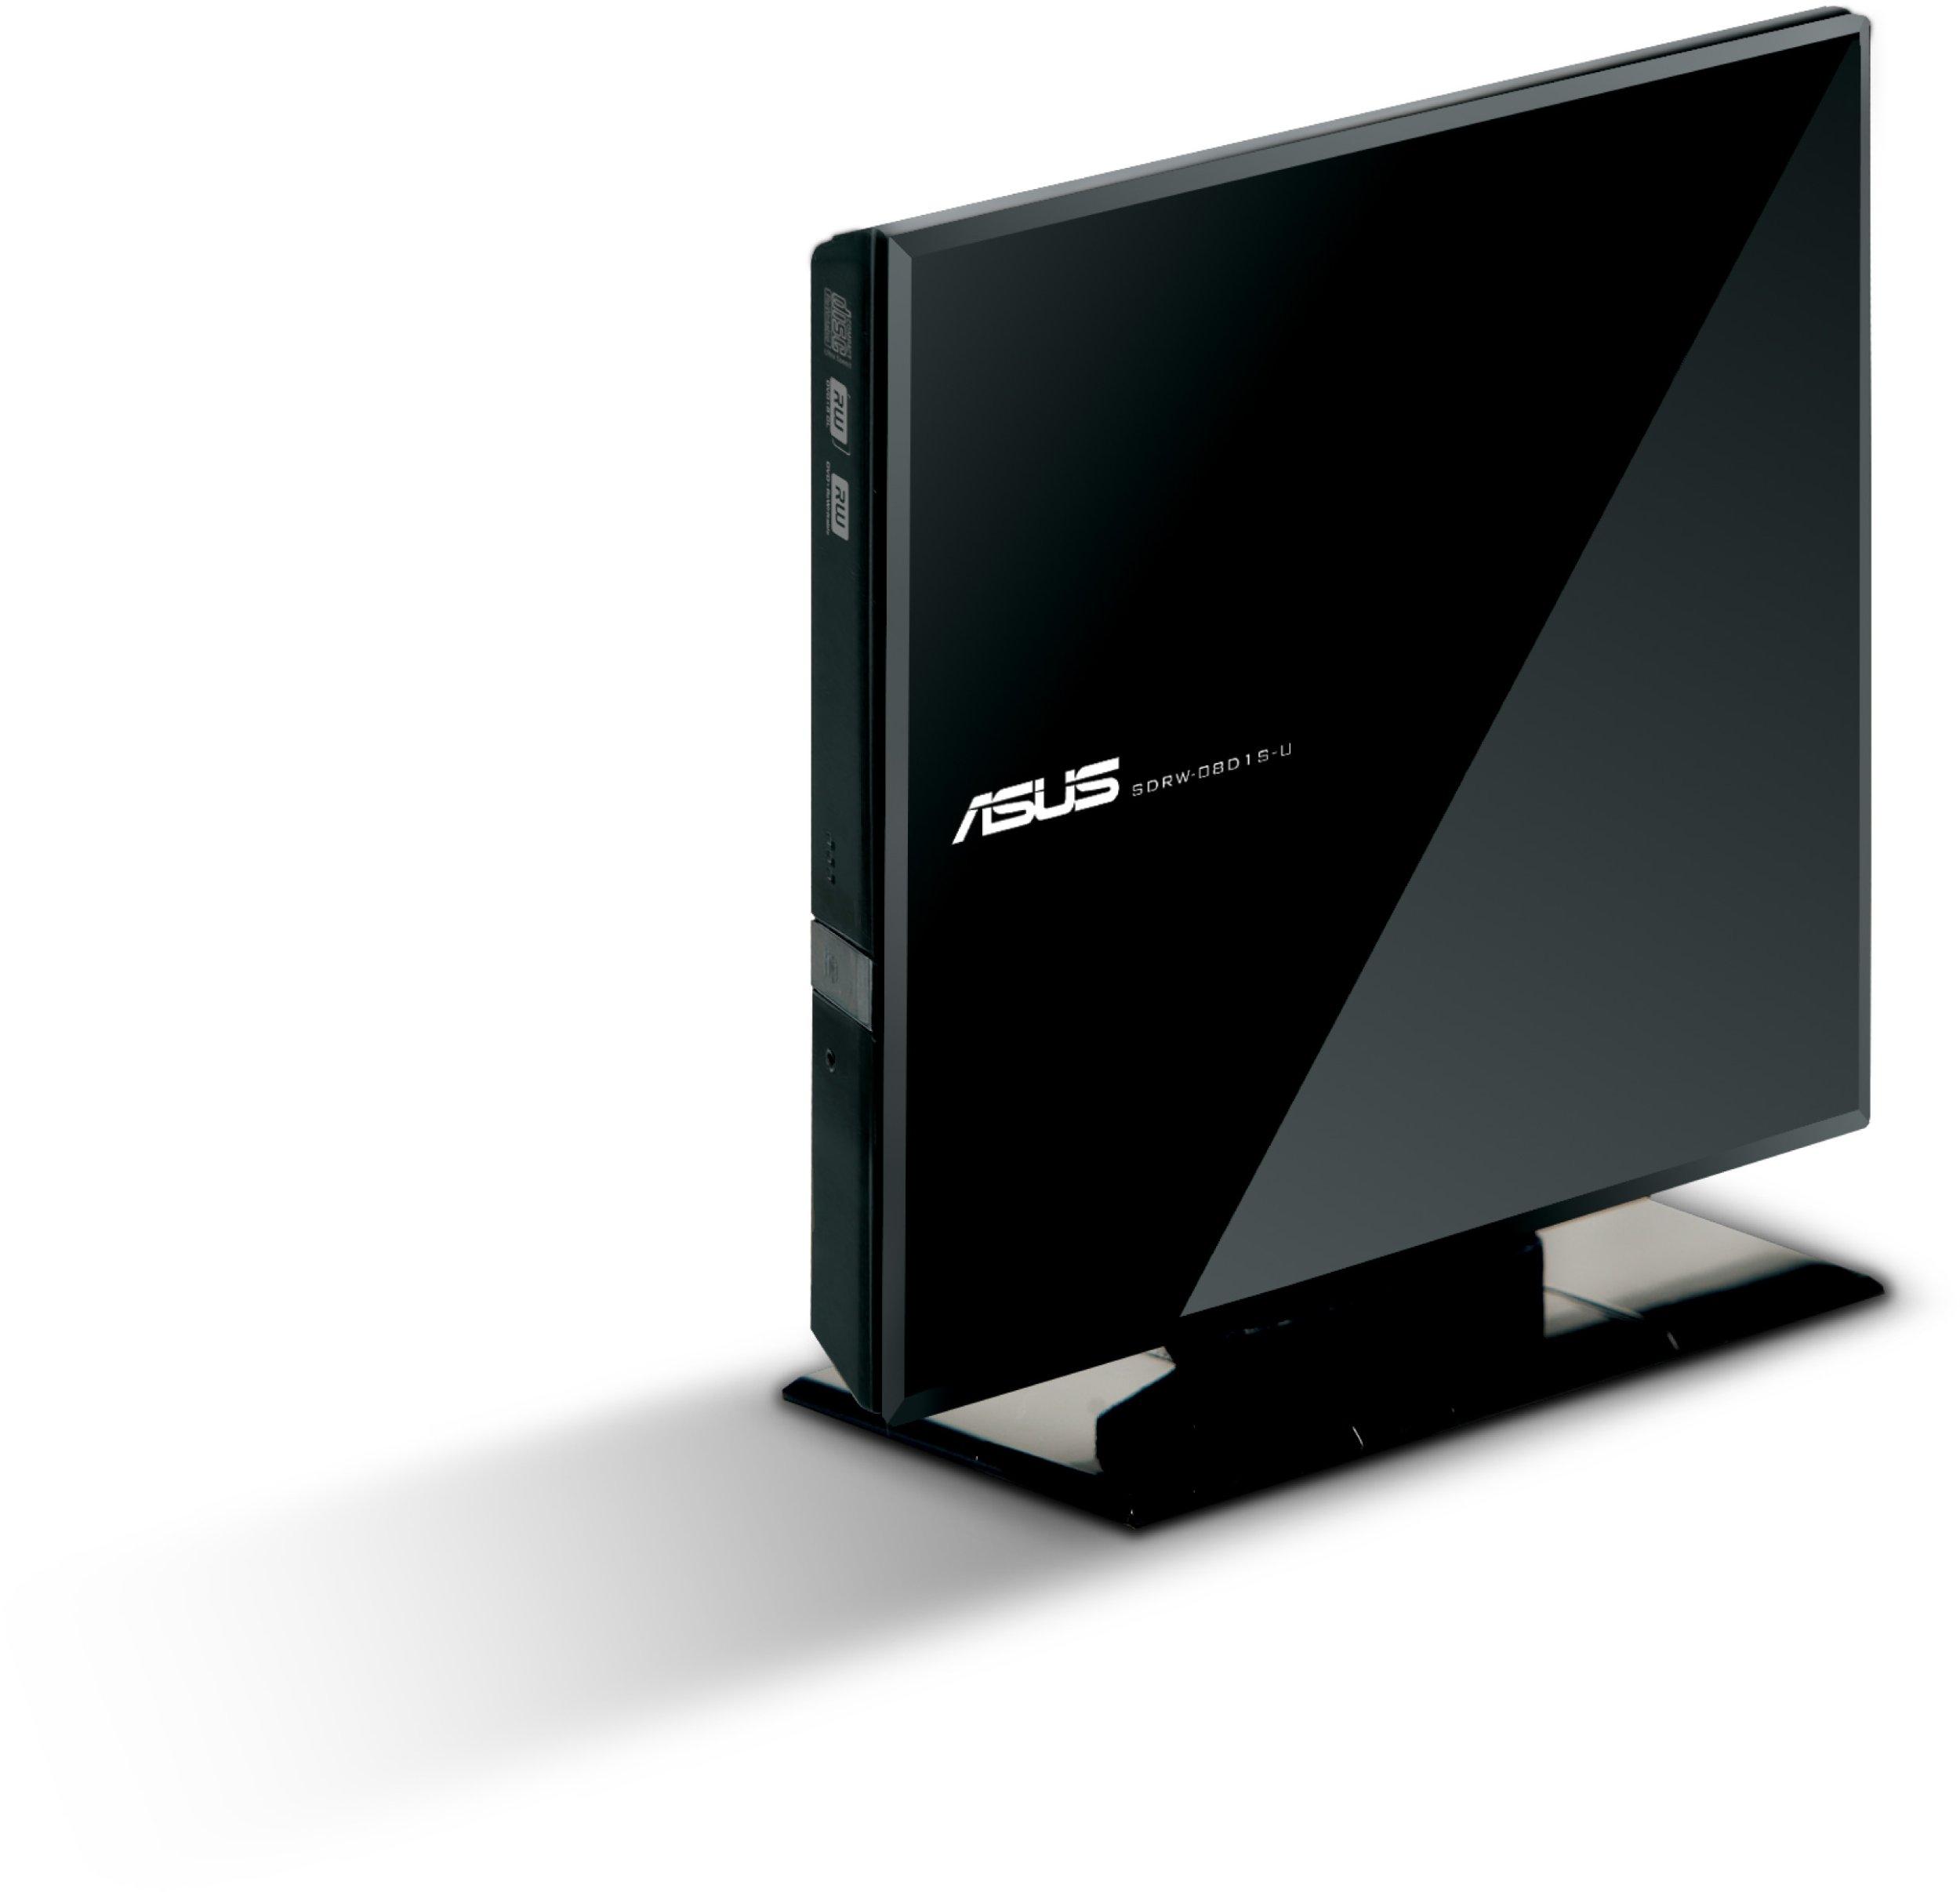 ASUS USB 2.0 8xDVD Writer External Optical Drive SDRW-08D1S-U (Black)